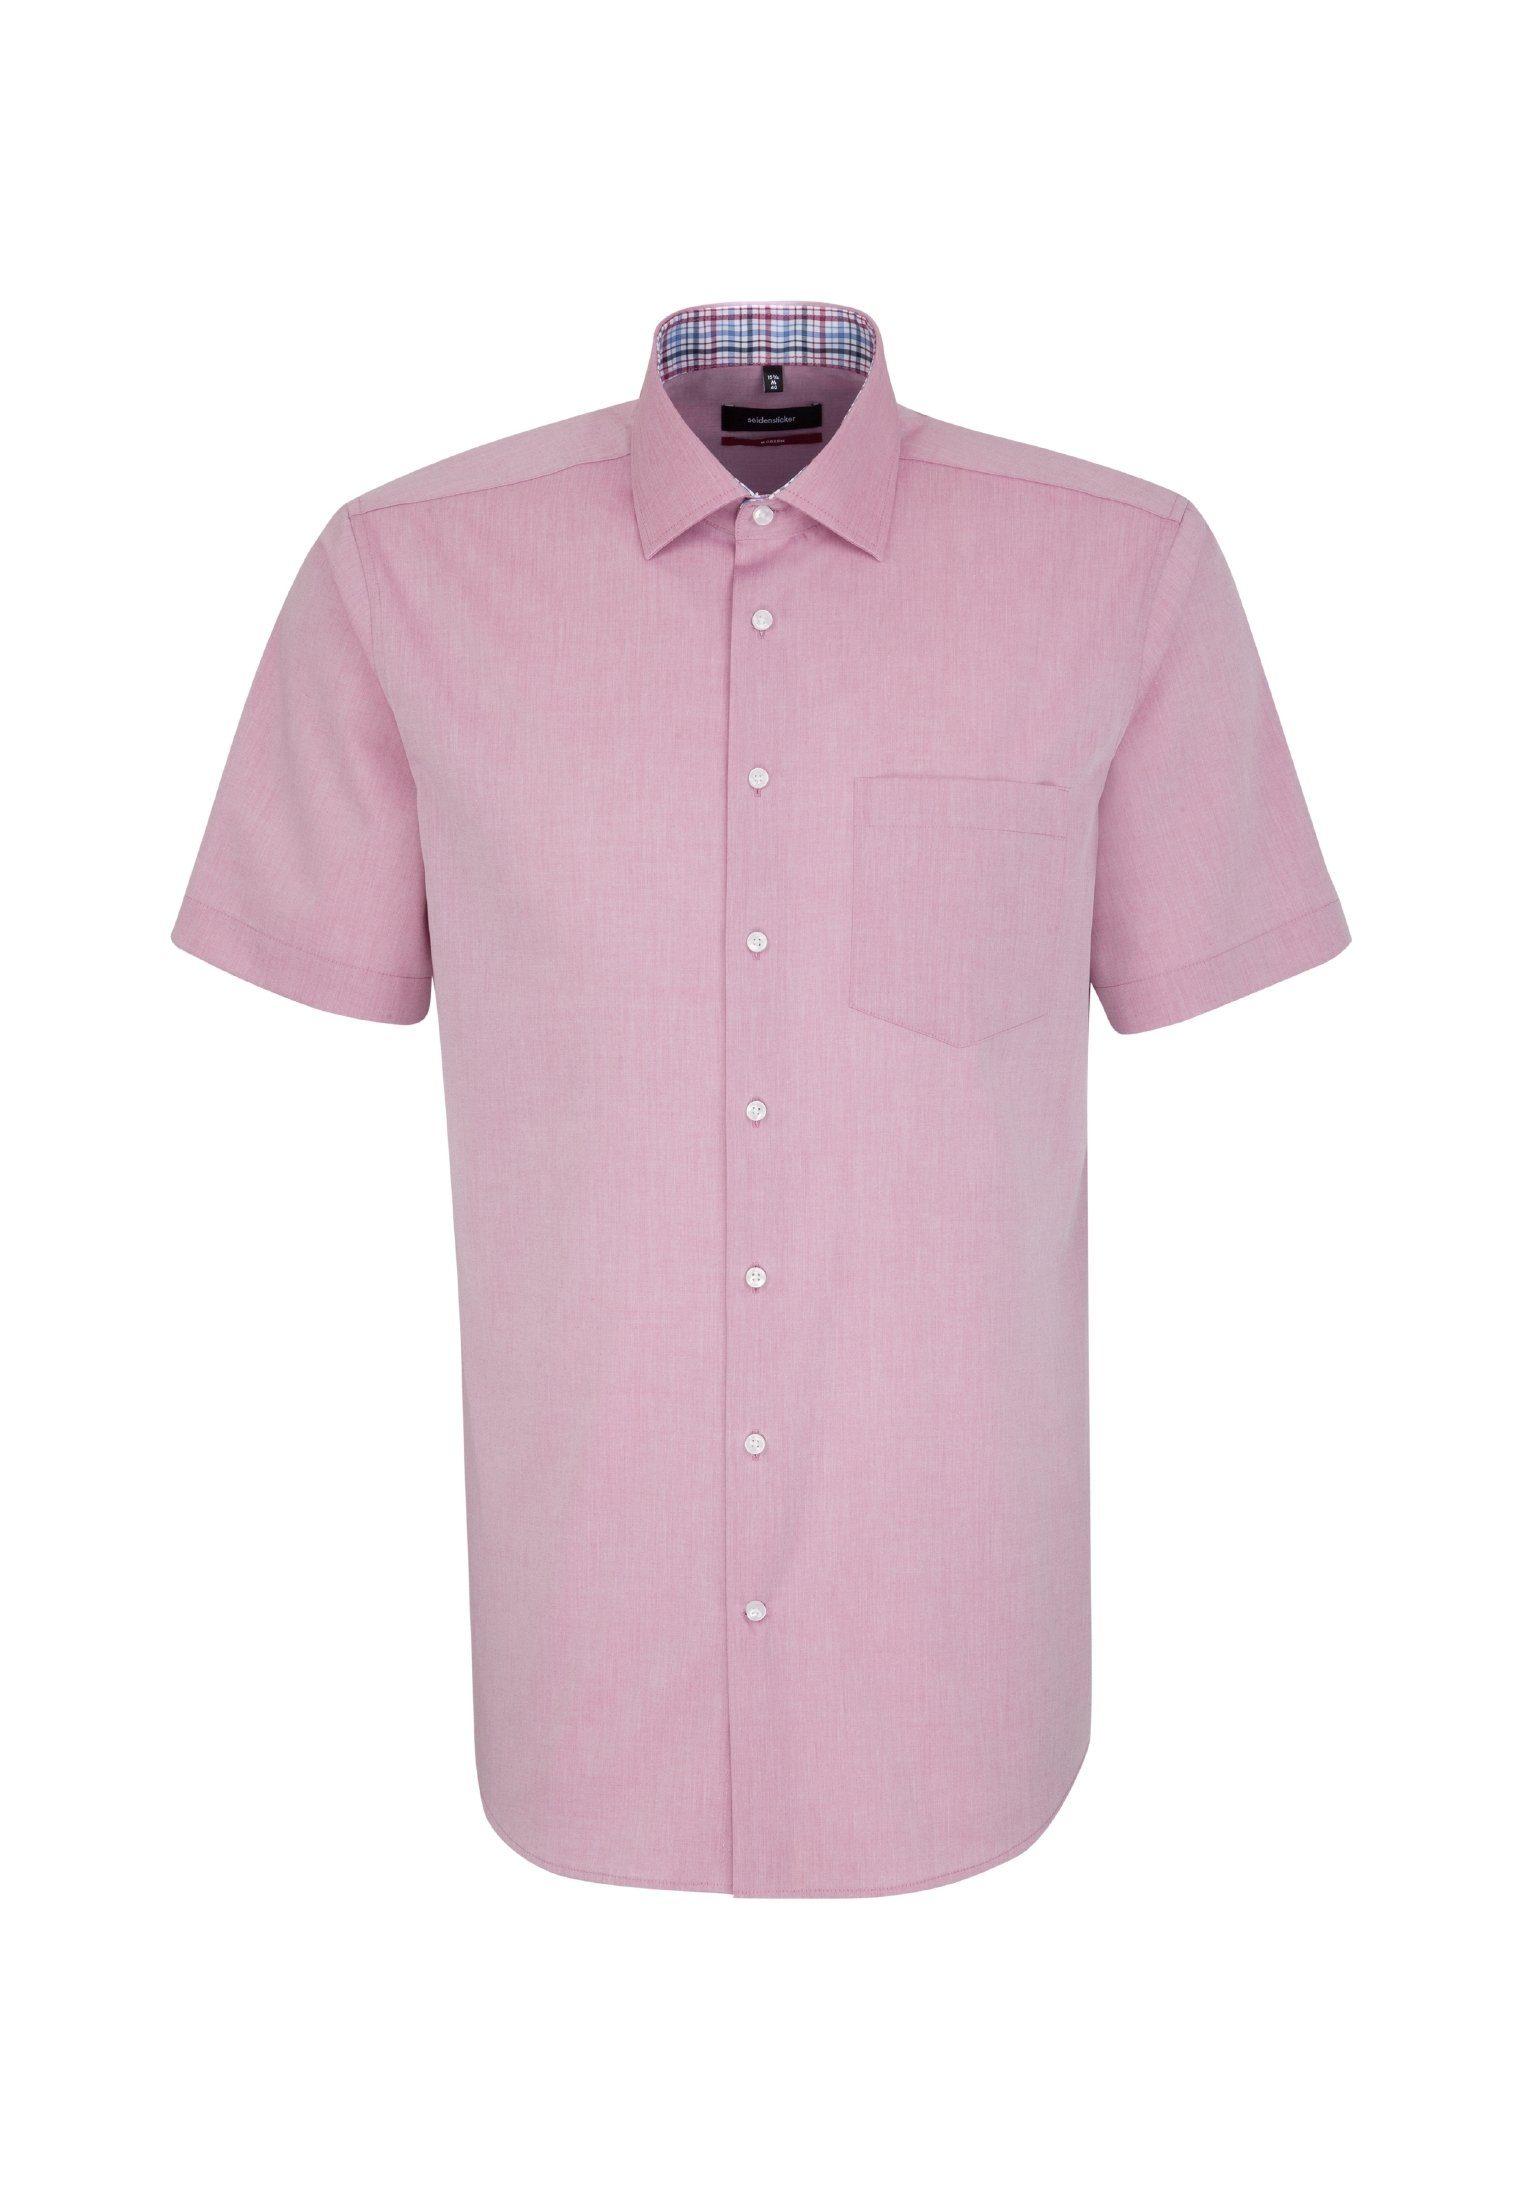 factory price affordable price sale online Business Hemden für Herren online kaufen | Herrenmode ...